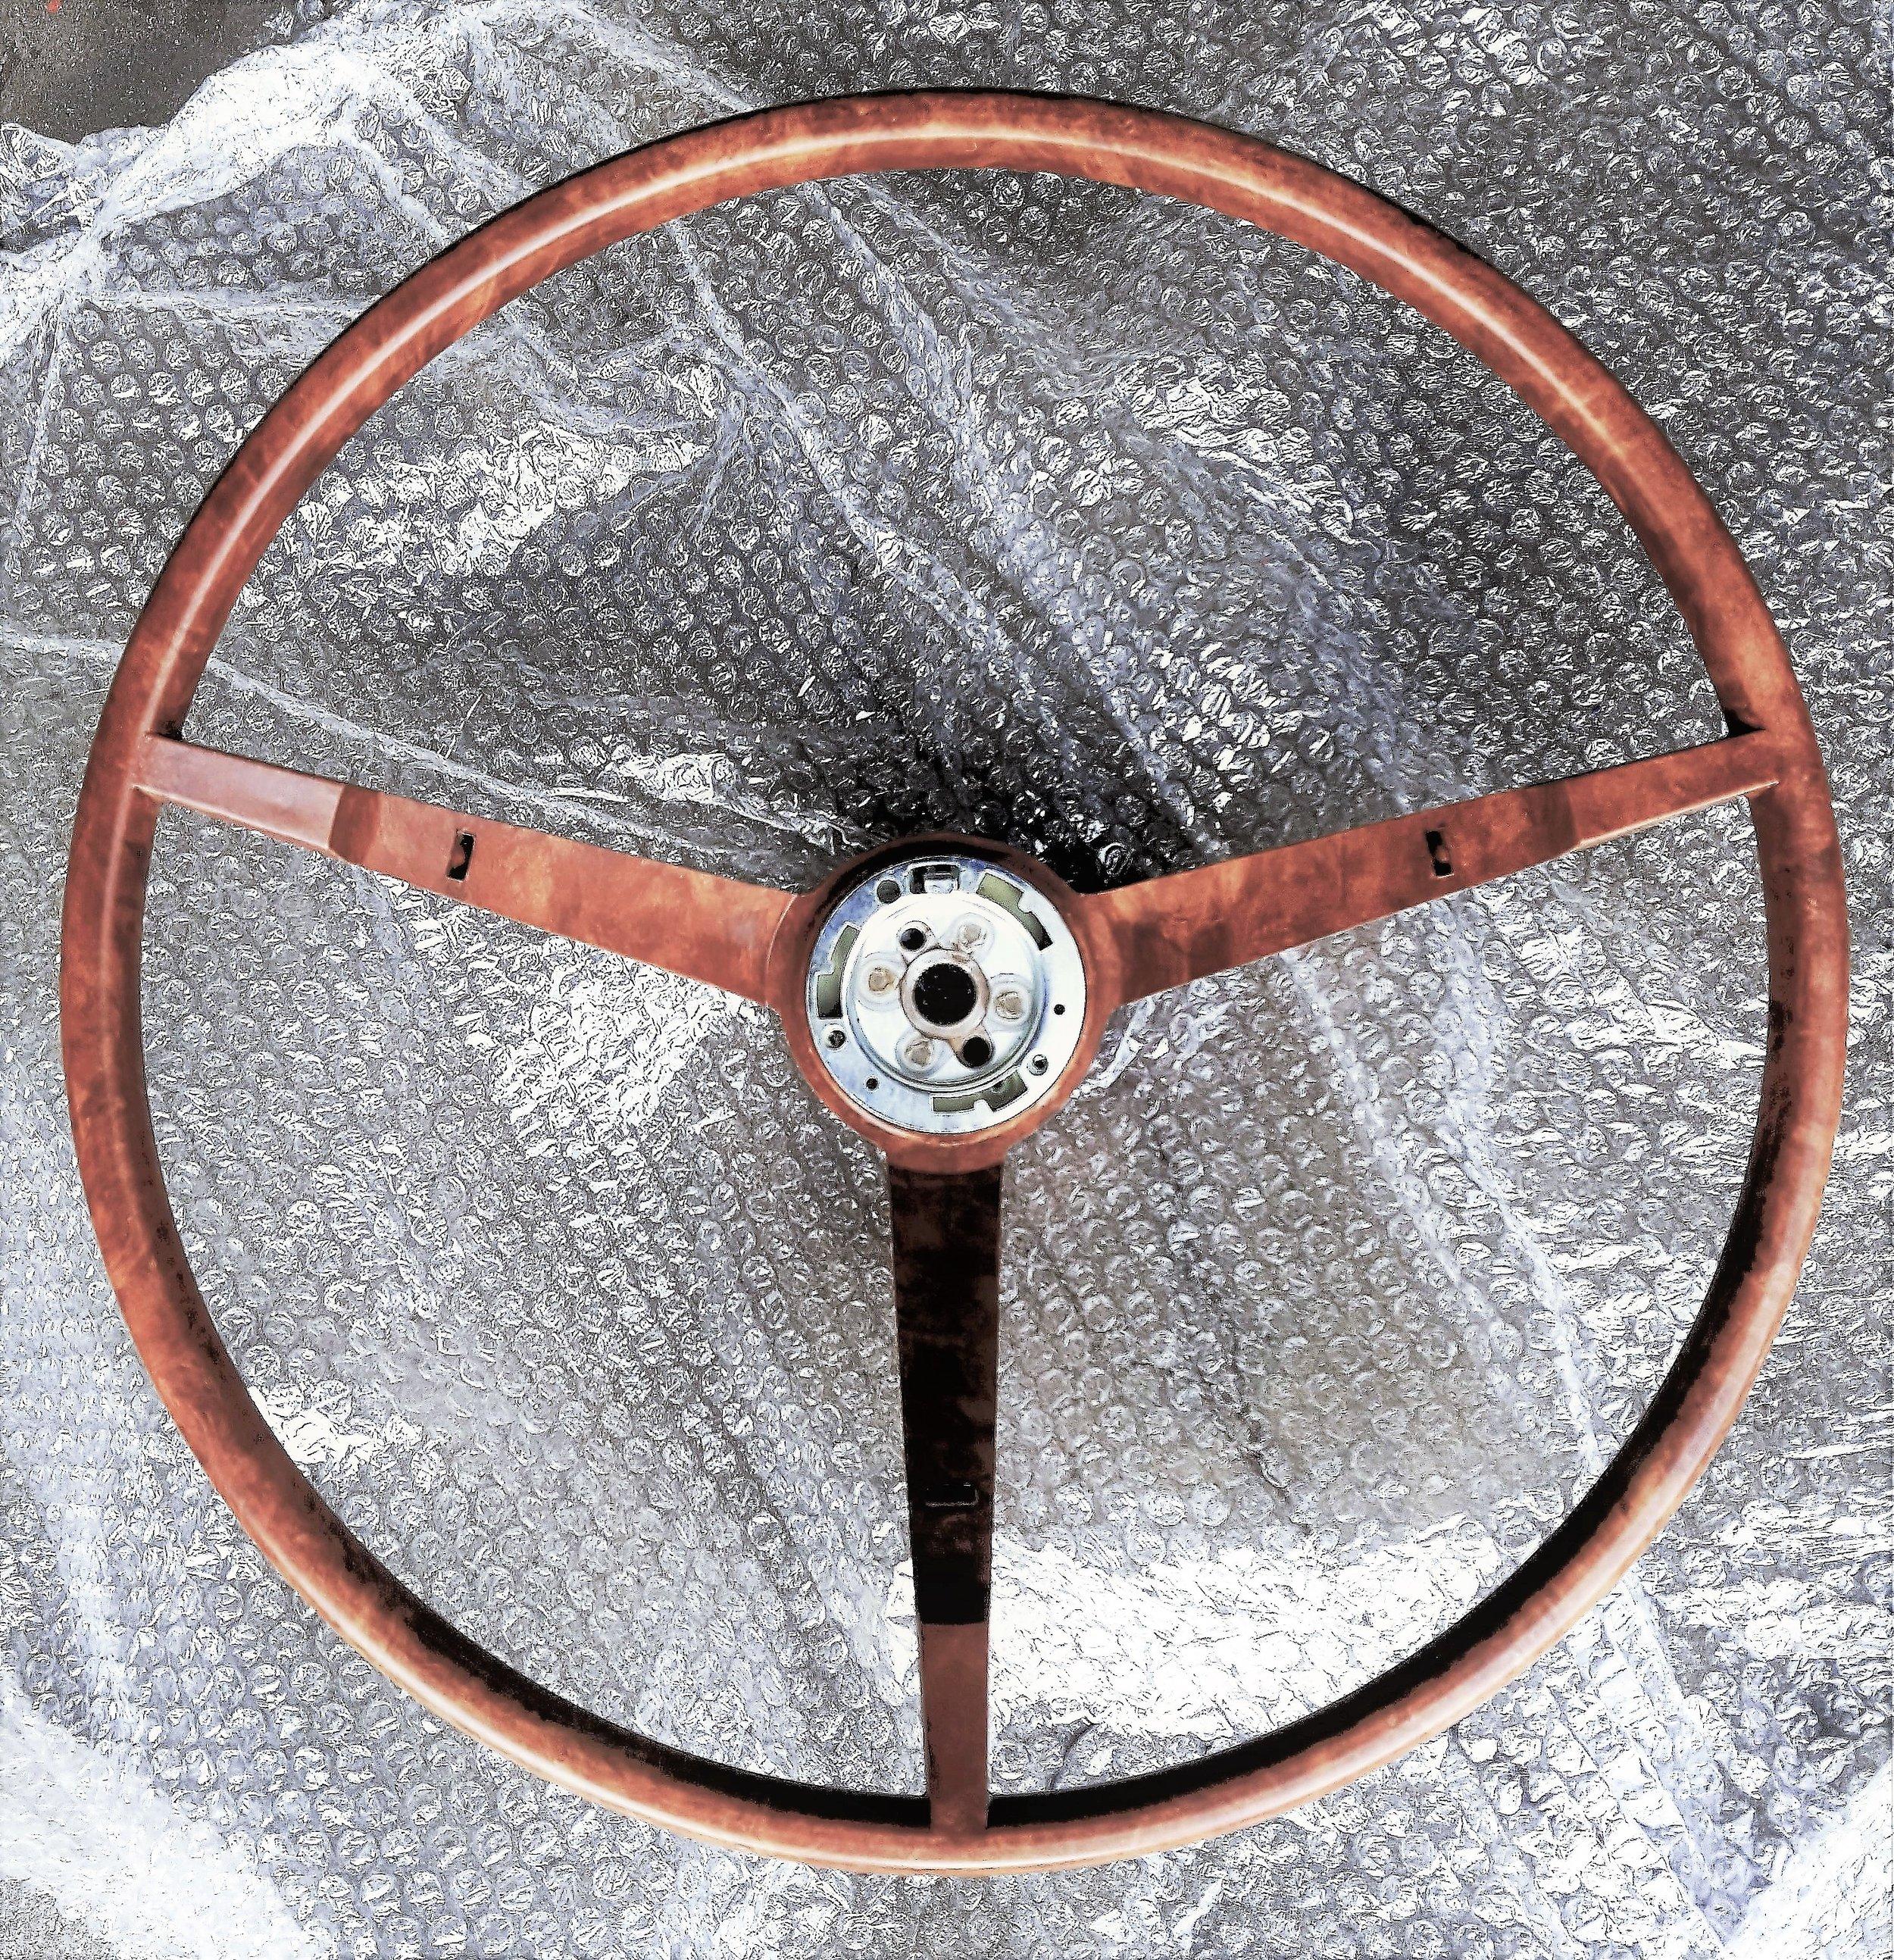 1963-64 Falcon Sprint deluxe steering wheel